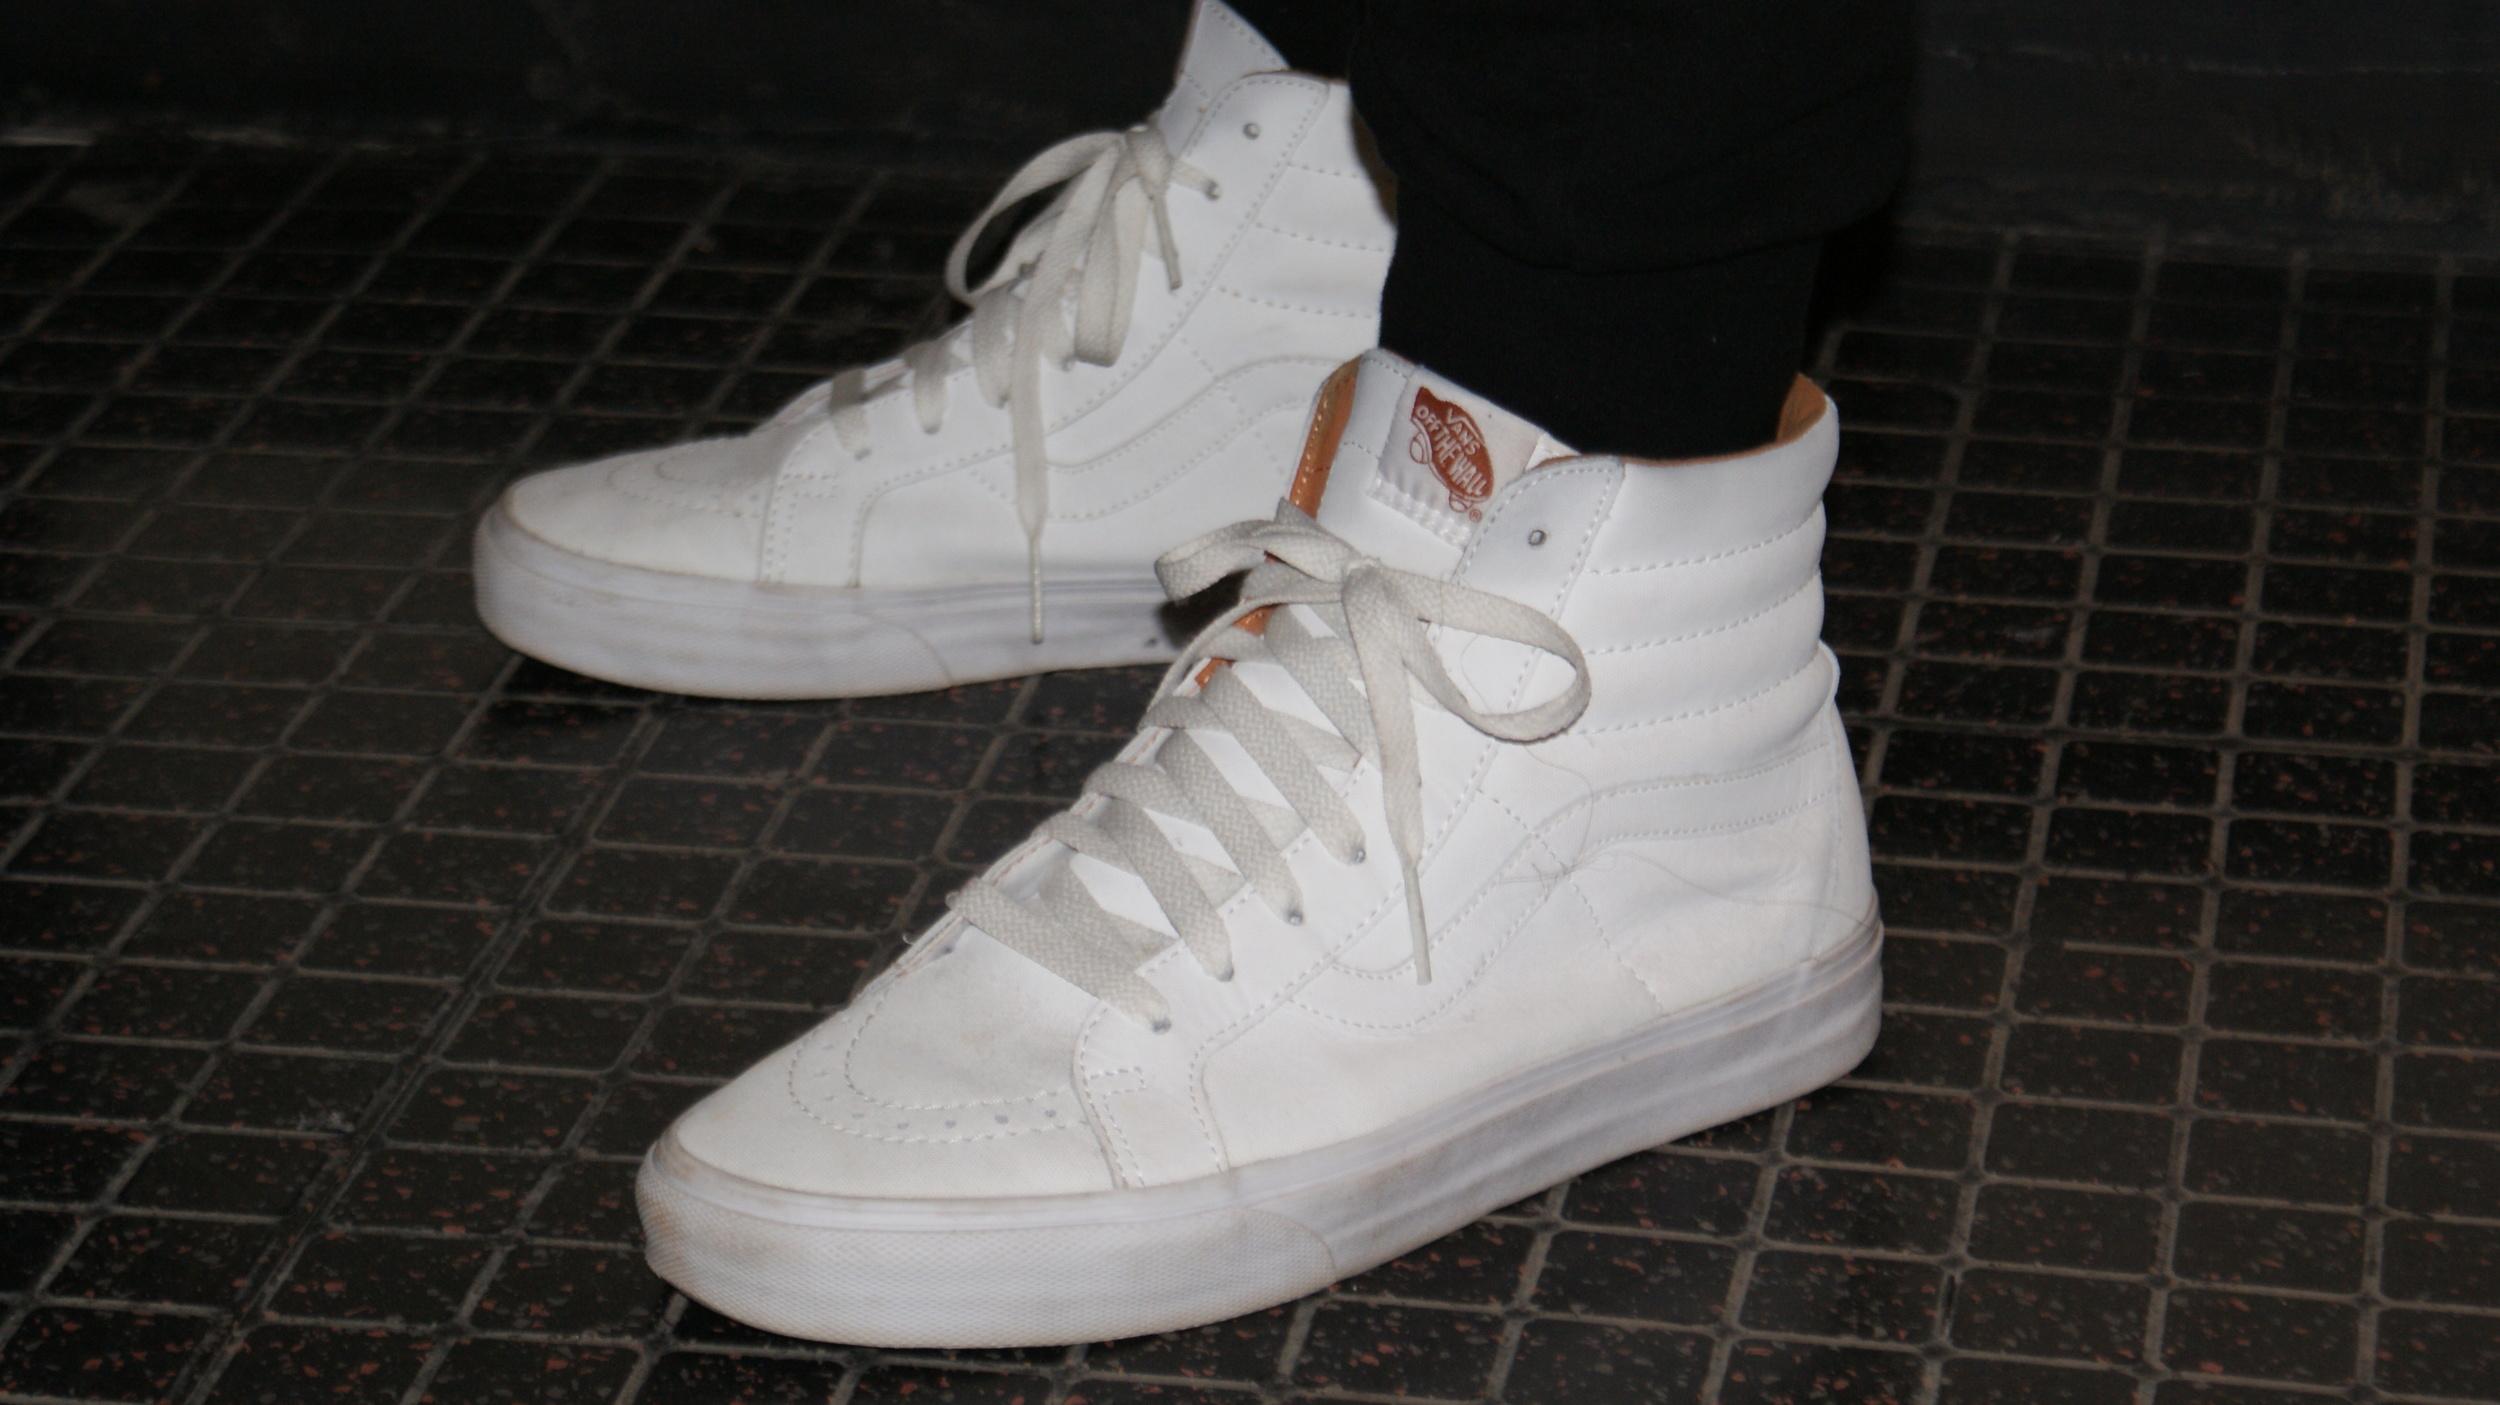 77bef5887b Shoe Review  Vans Sk8-Hi